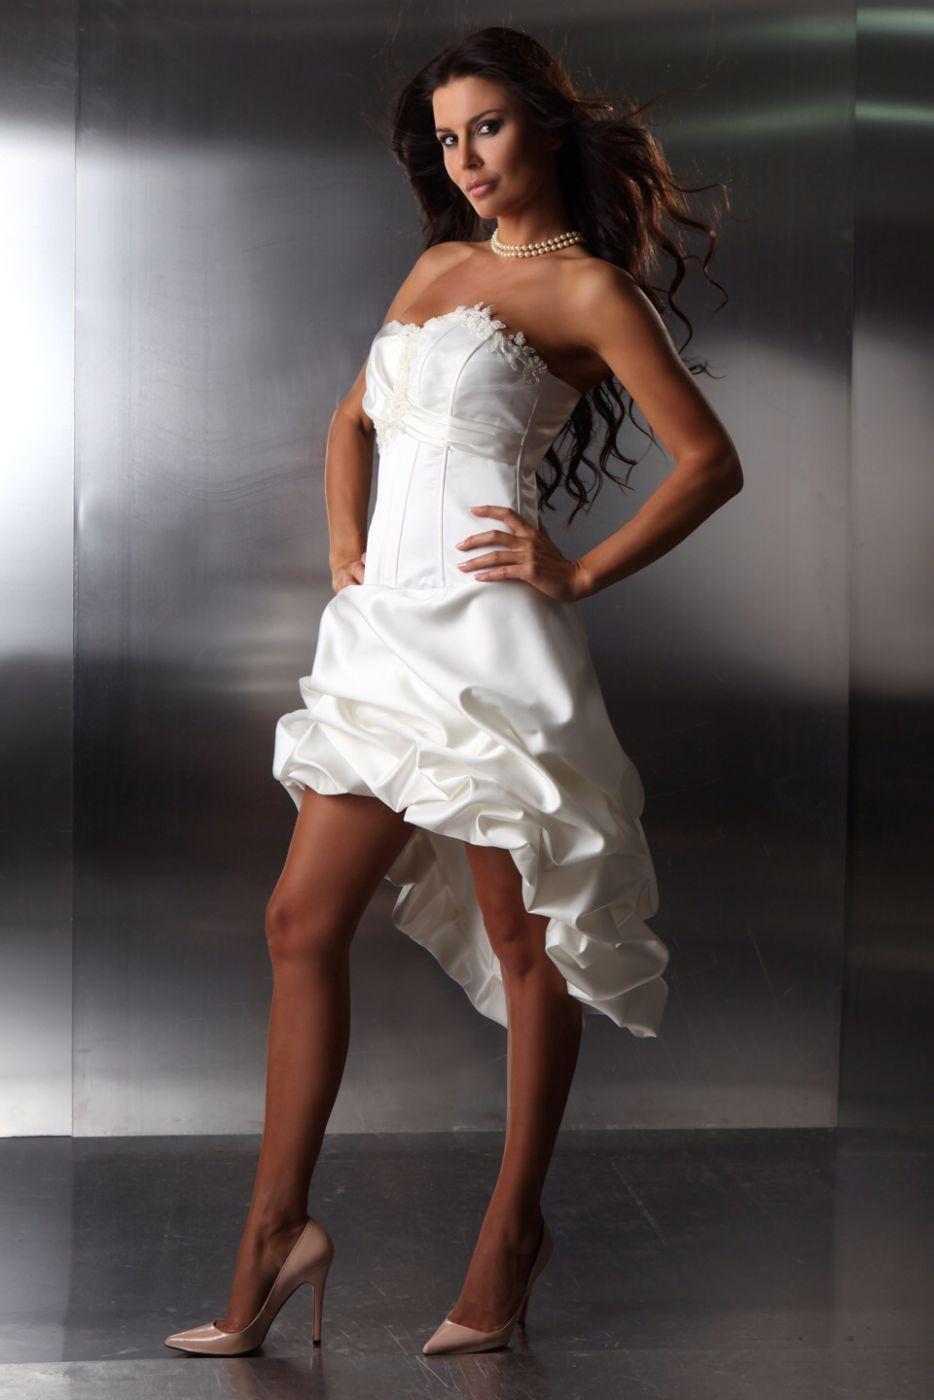 Standesamtkleid Brautkleid Vorne Kurz Hinten Lang Taft Kleiderfreuden